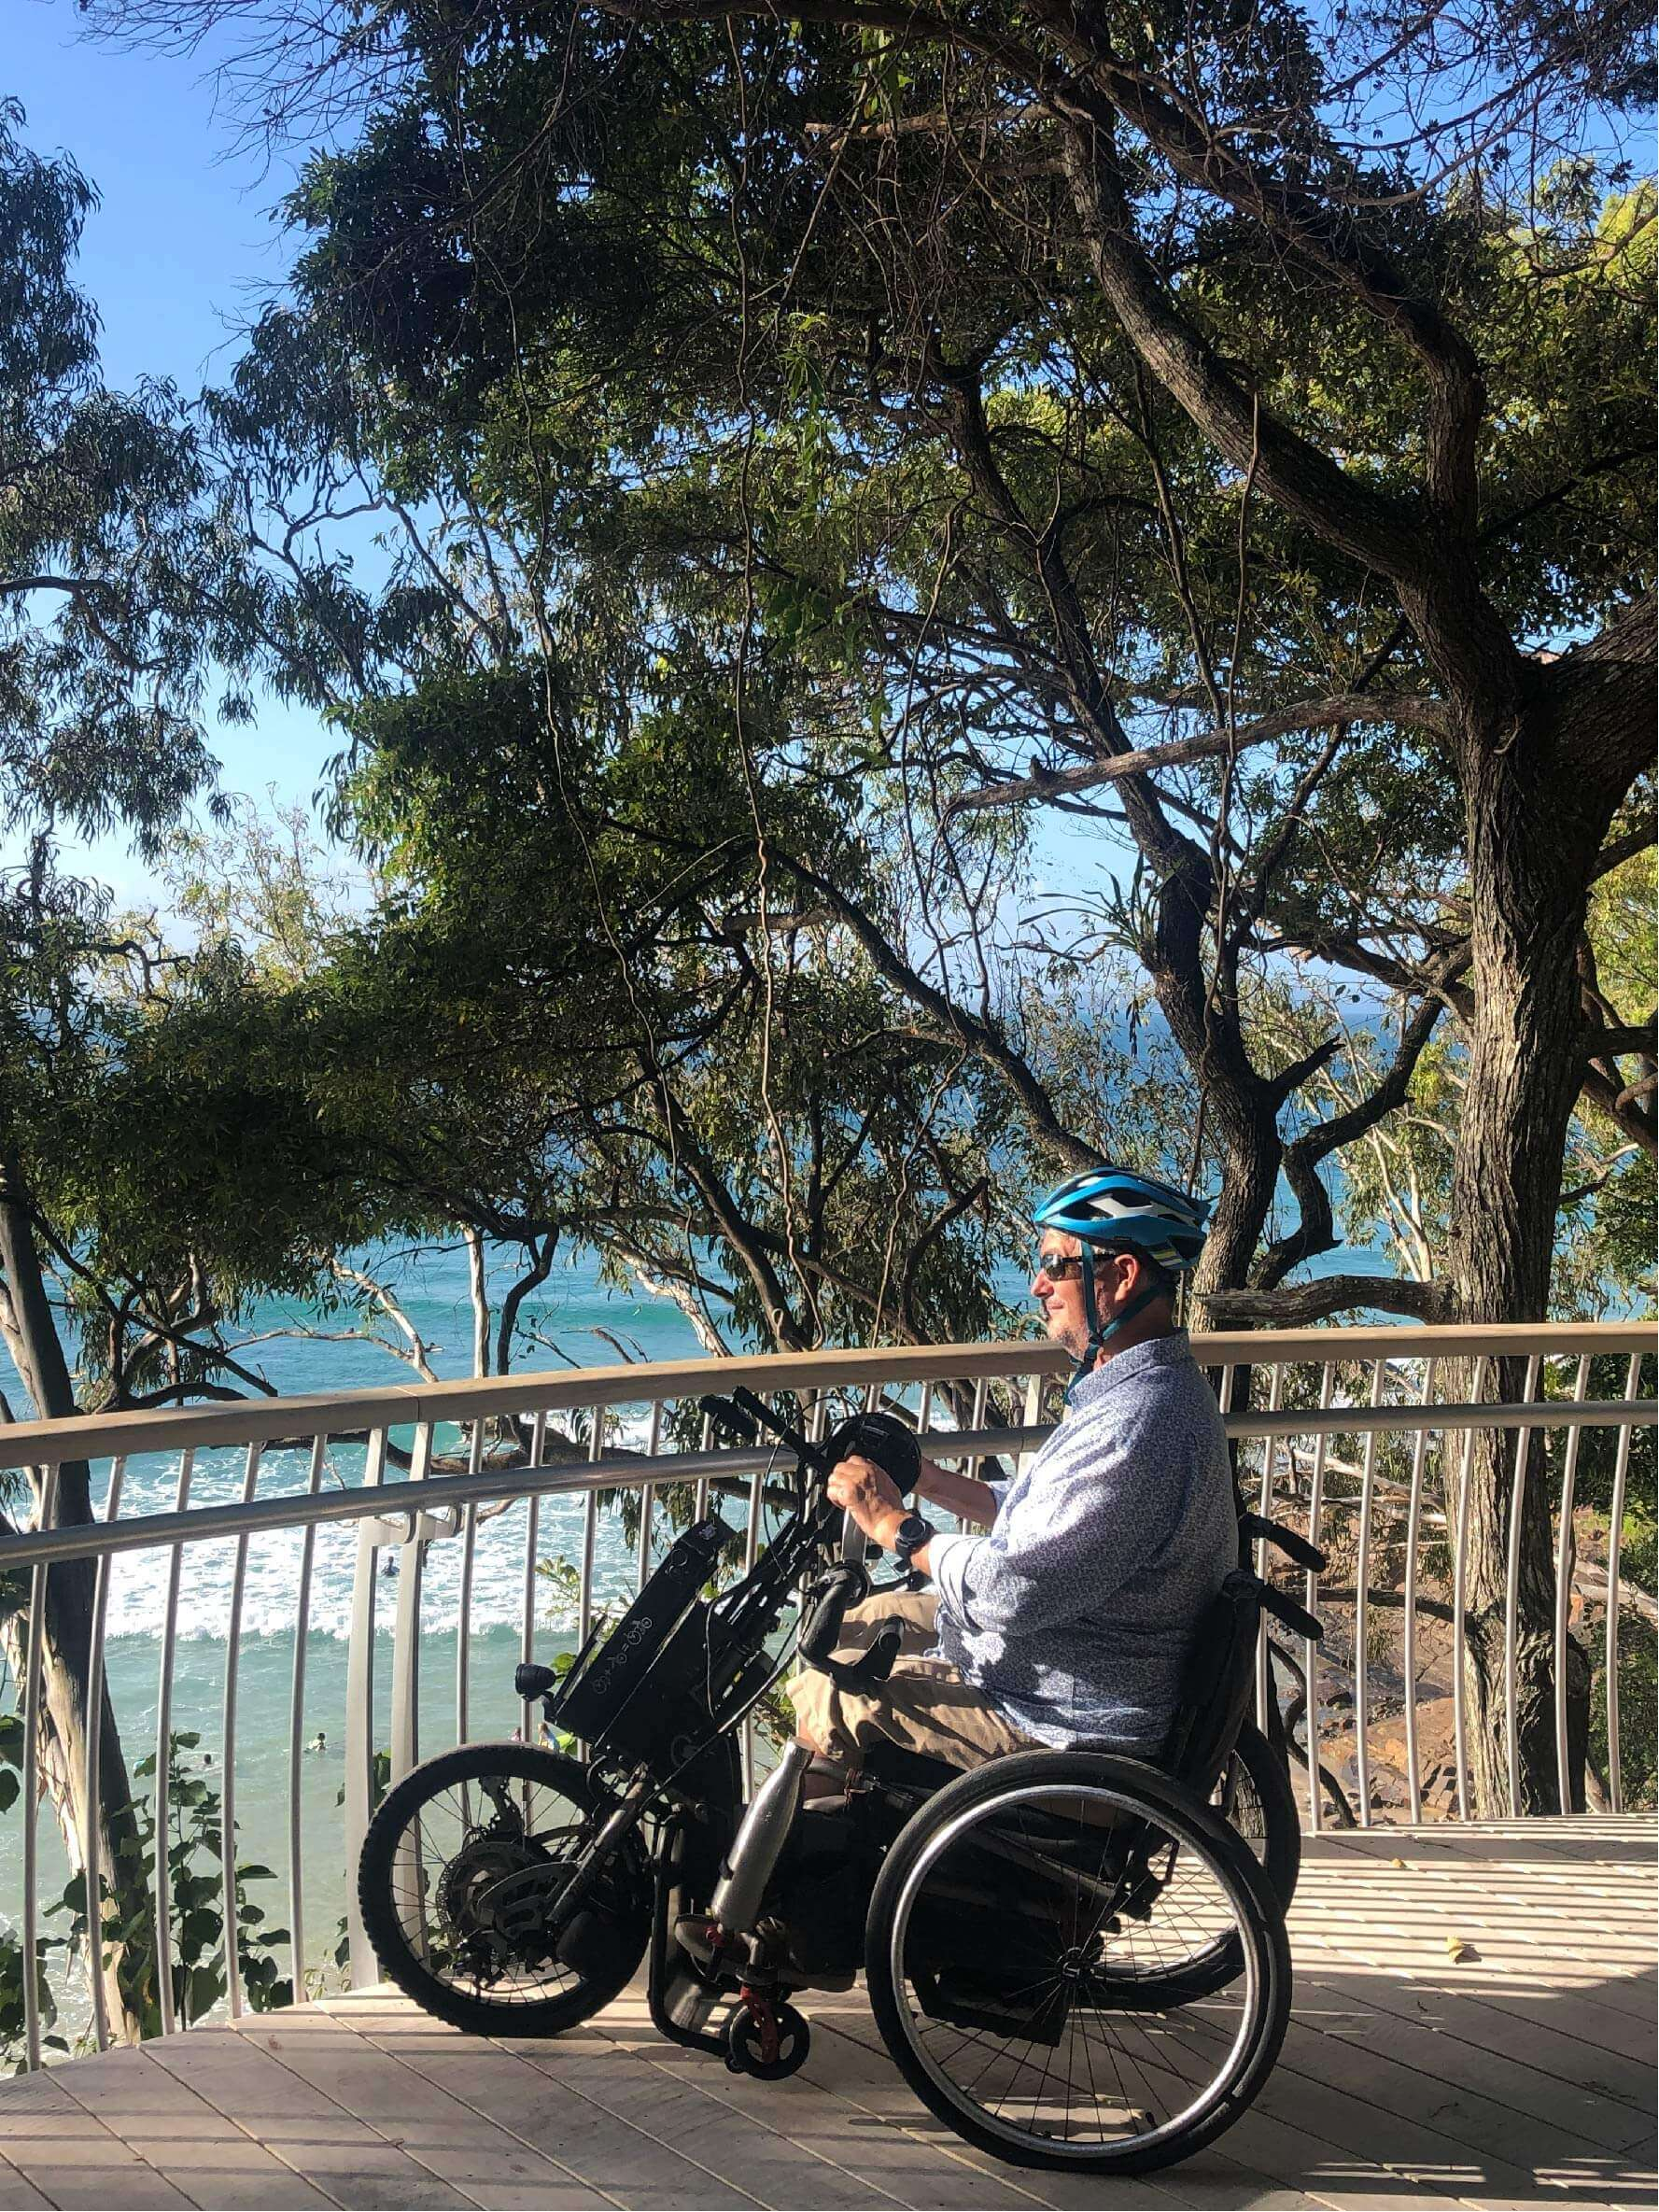 Man smiling in 3 wheeled wheel chair looking over ocean